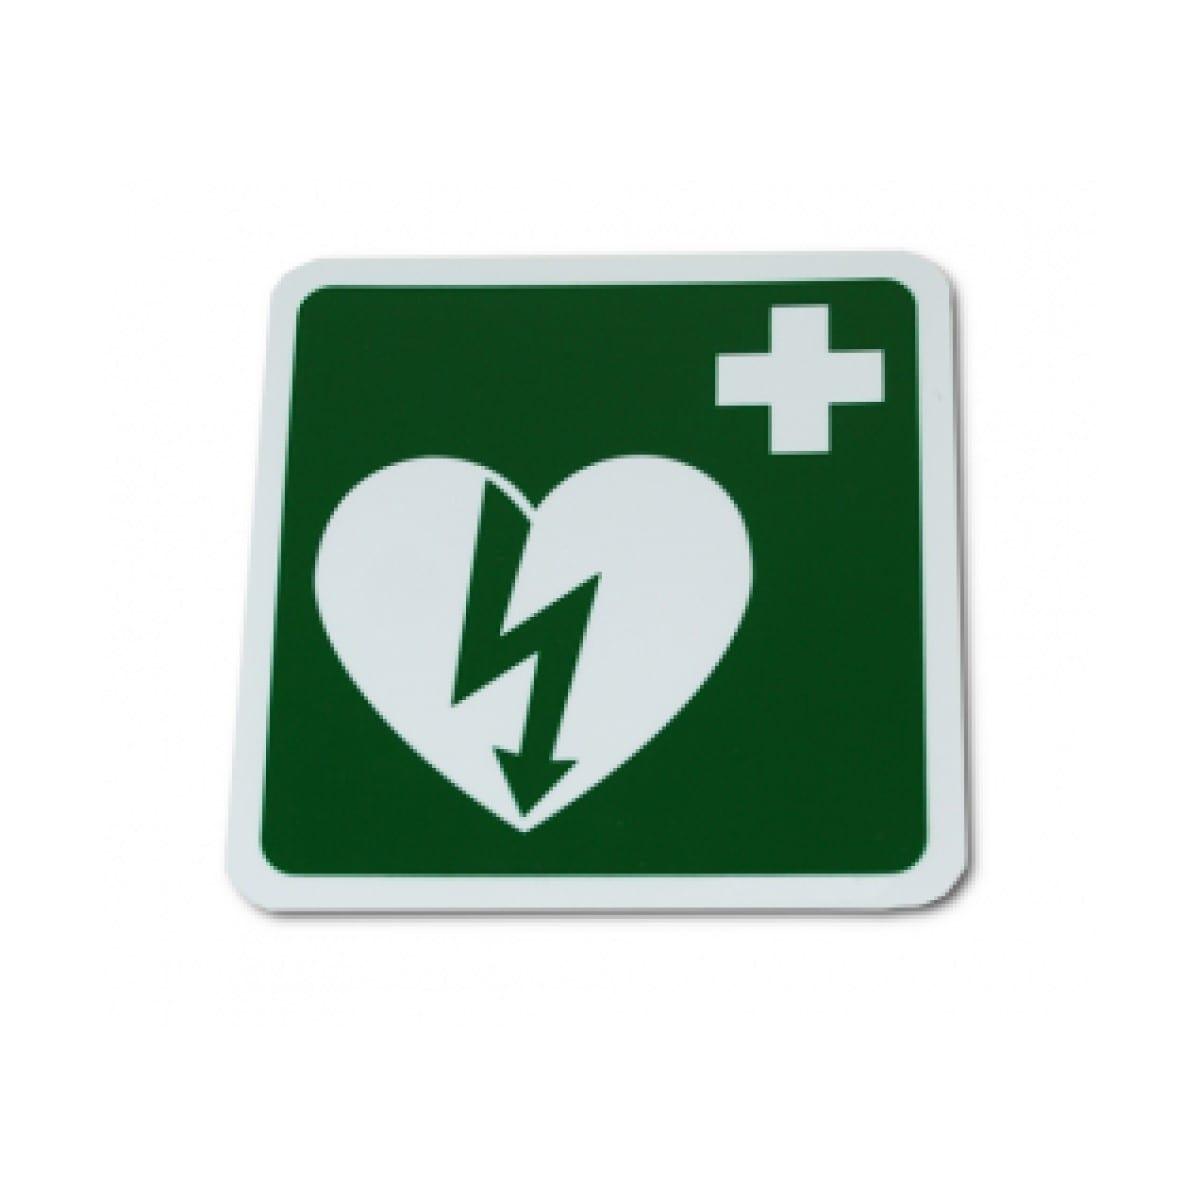 AED bord 15x15 - Janhofman.nl - 1